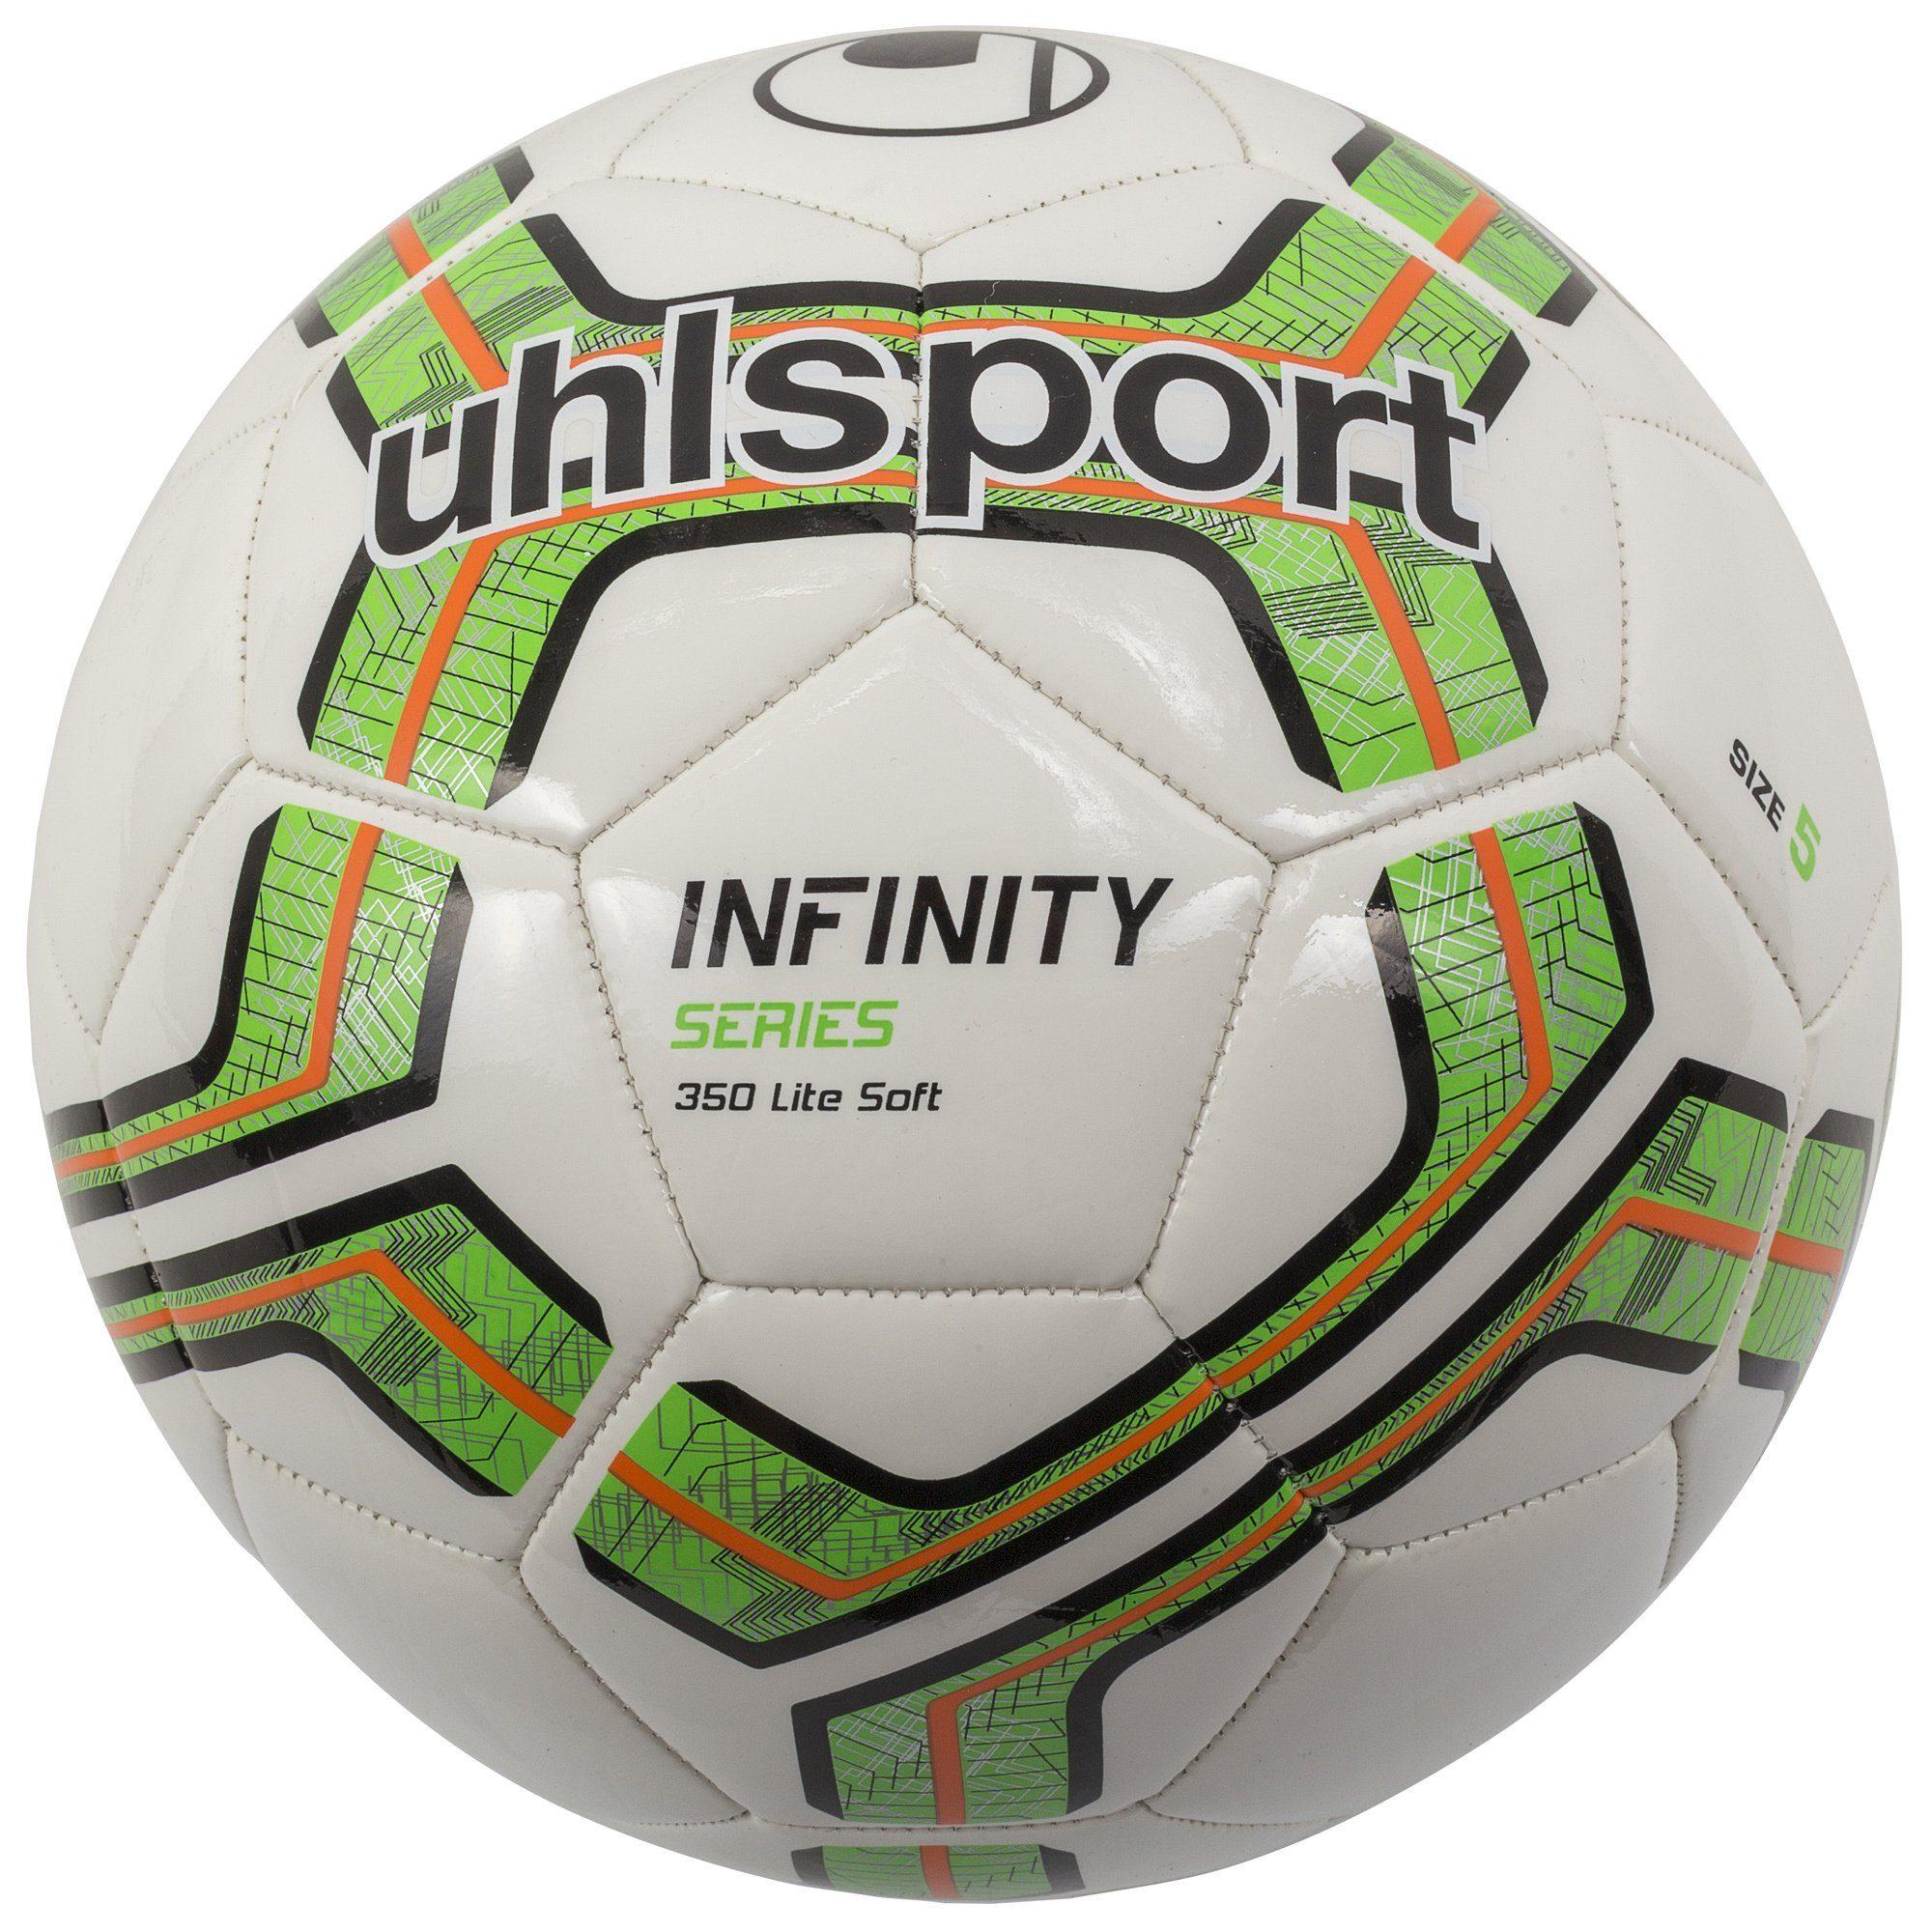 UHLSPORT Infinity 350 Lite Soft Fußball